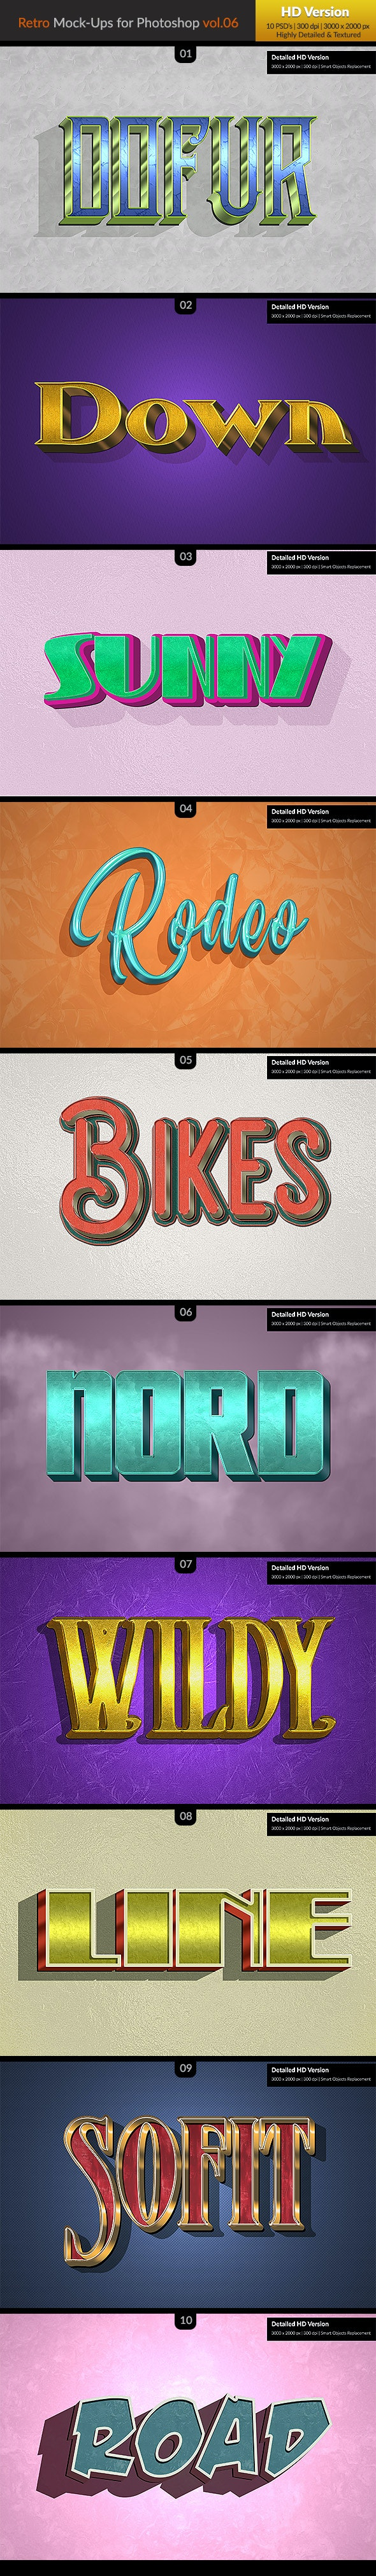 10 Retro Mock-Ups vol. 06 - Text Effects Styles